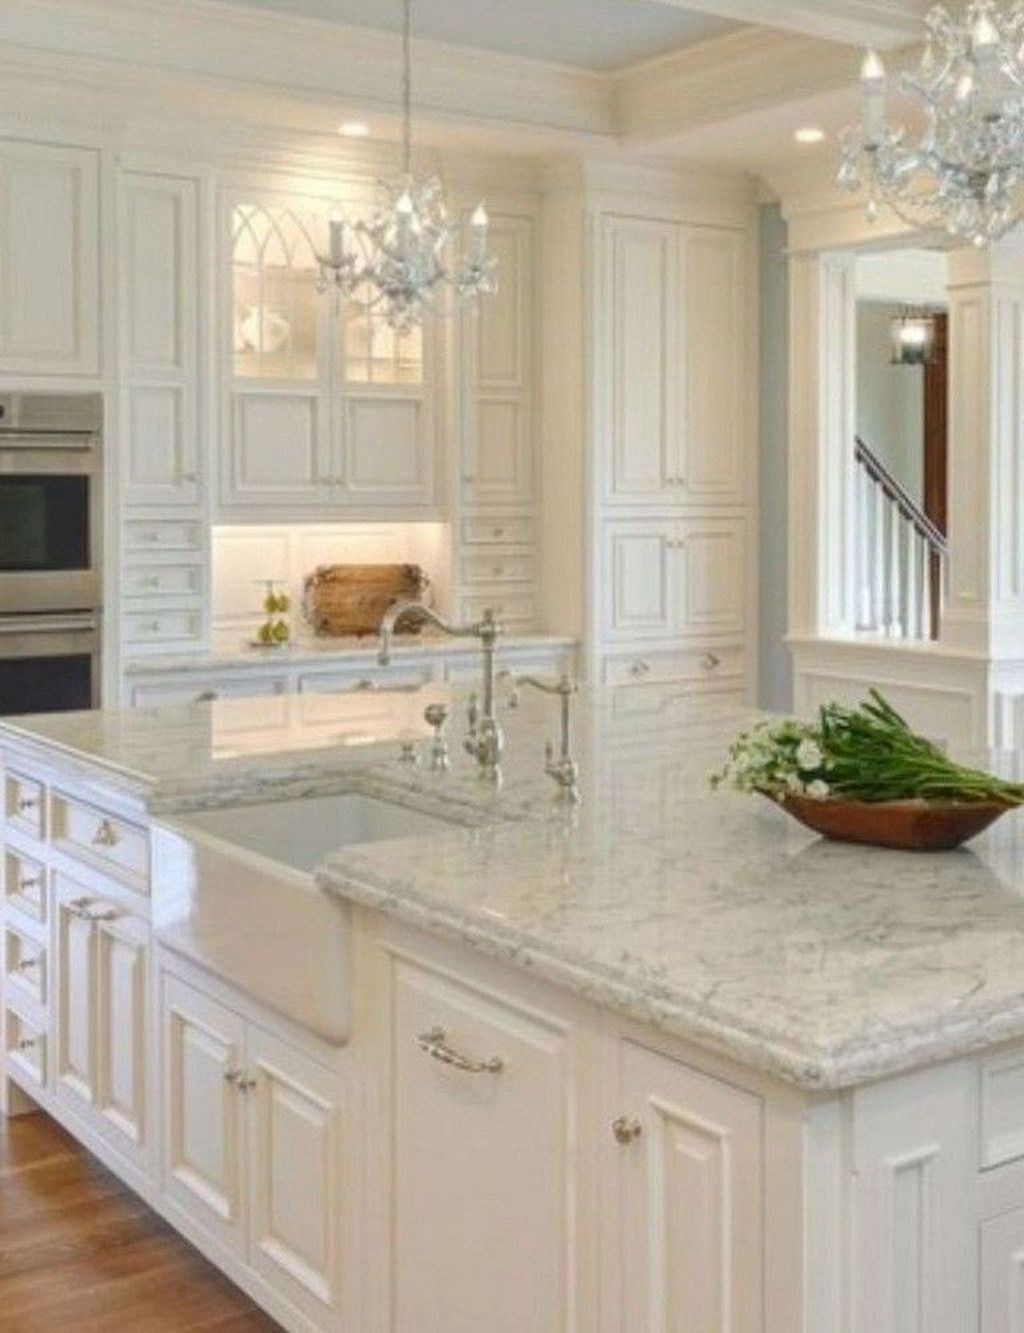 The Best Kitchen Decorating Ideas White Kitchen Design Kitchen Cabinet Design Kitchen Cabinets Decor